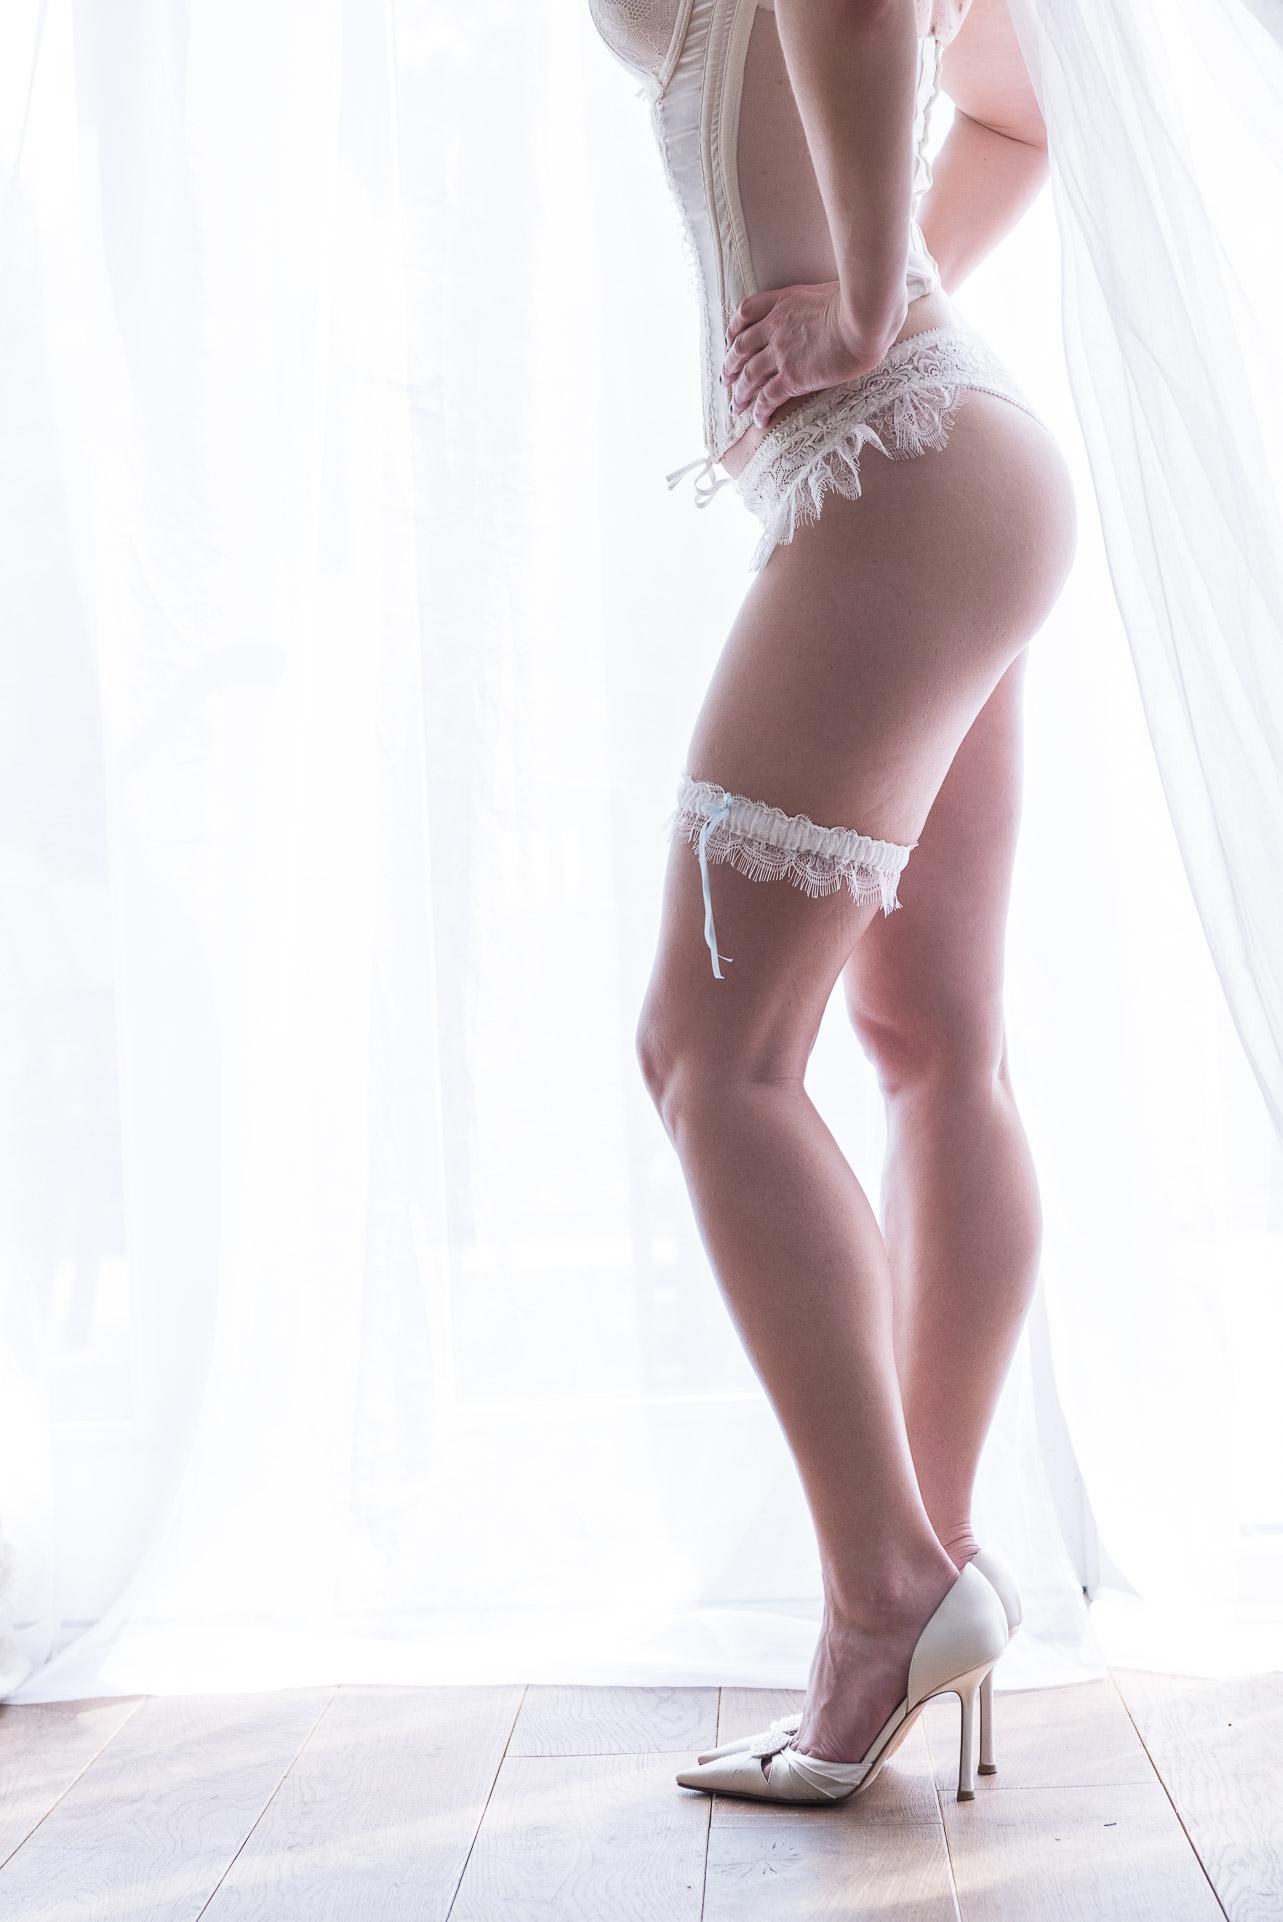 Bridal Boudoir photography featuring bride showcasing designer lingerie and veil